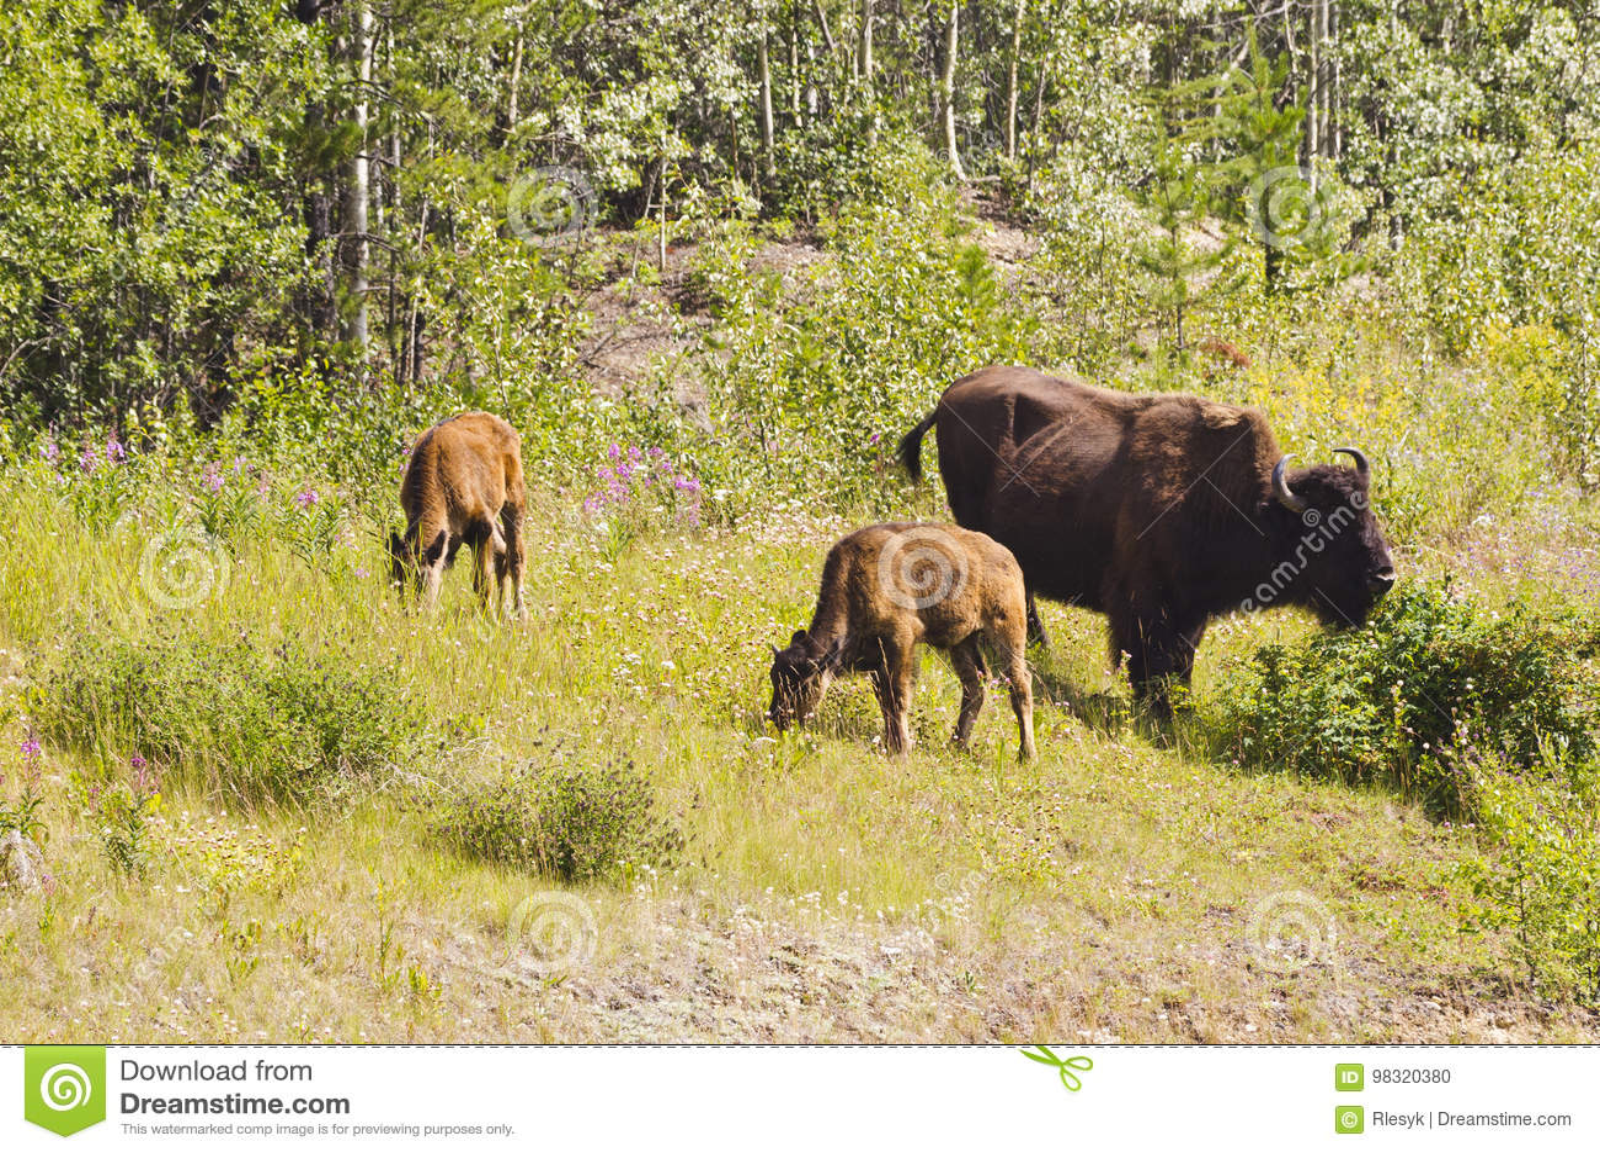 Bison calves grazing